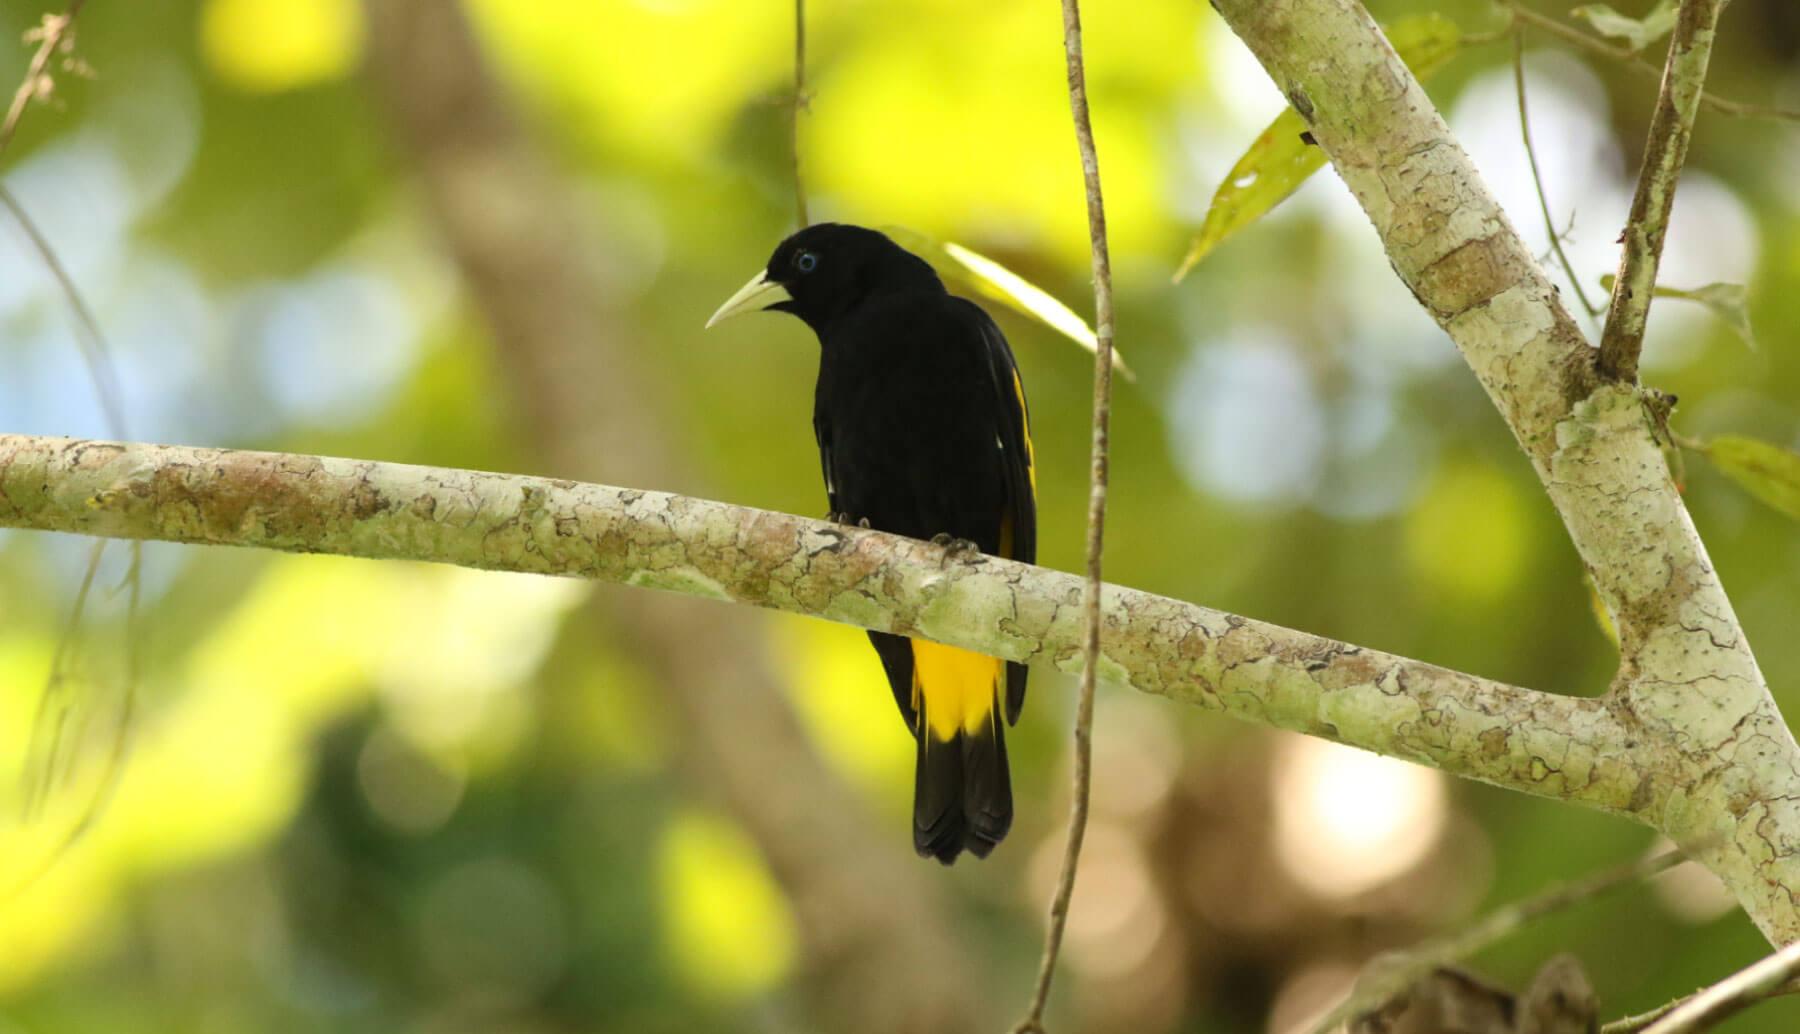 Black bird in a tree in Ecuador